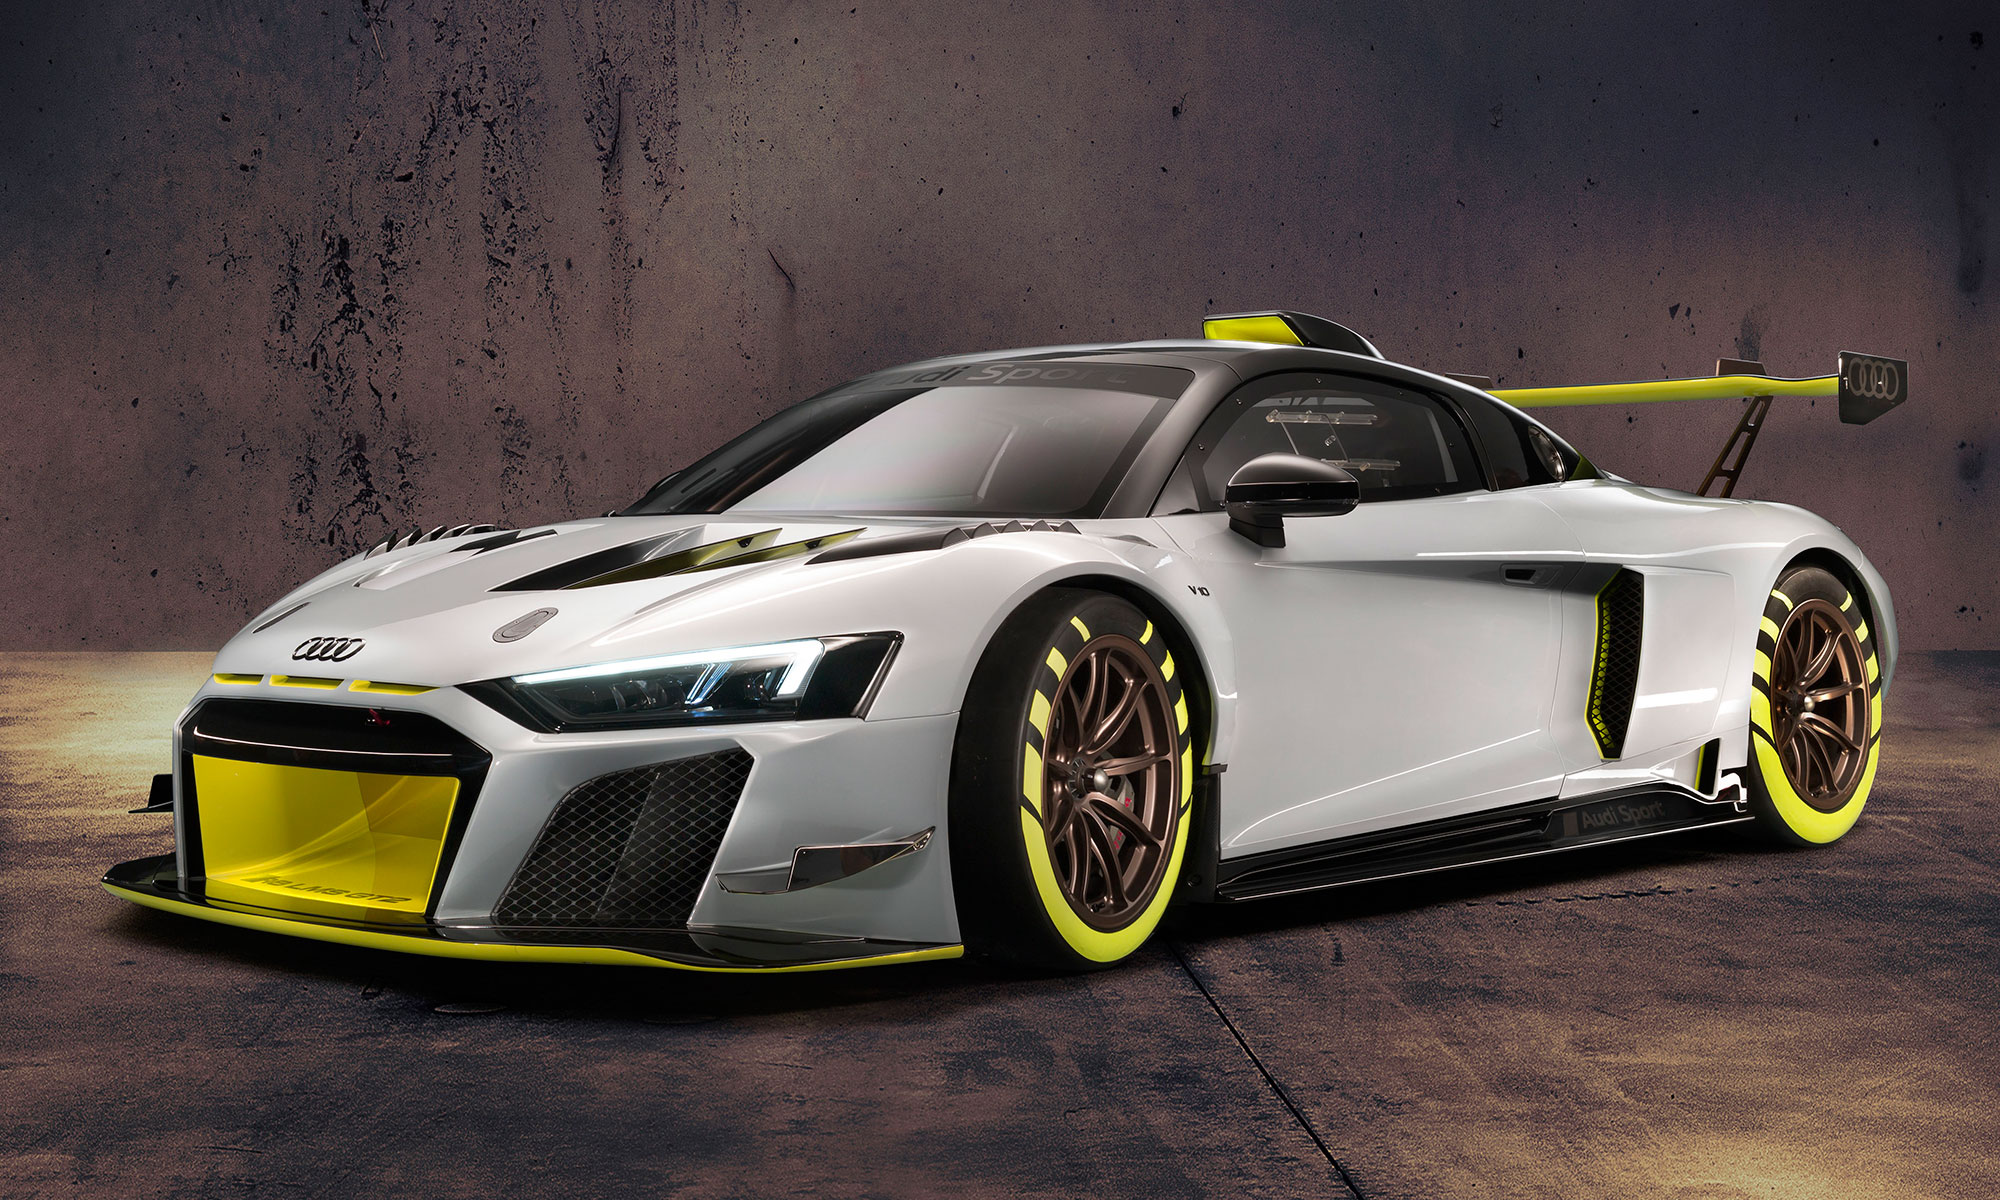 2020 car, sports car, race car, audi, audi r8, lms gt2, Audi R8 LMS GT2, wild race car, 630 horsepower, race, youtube, video, audi sport, supercar, V10 engine, drivers, speed